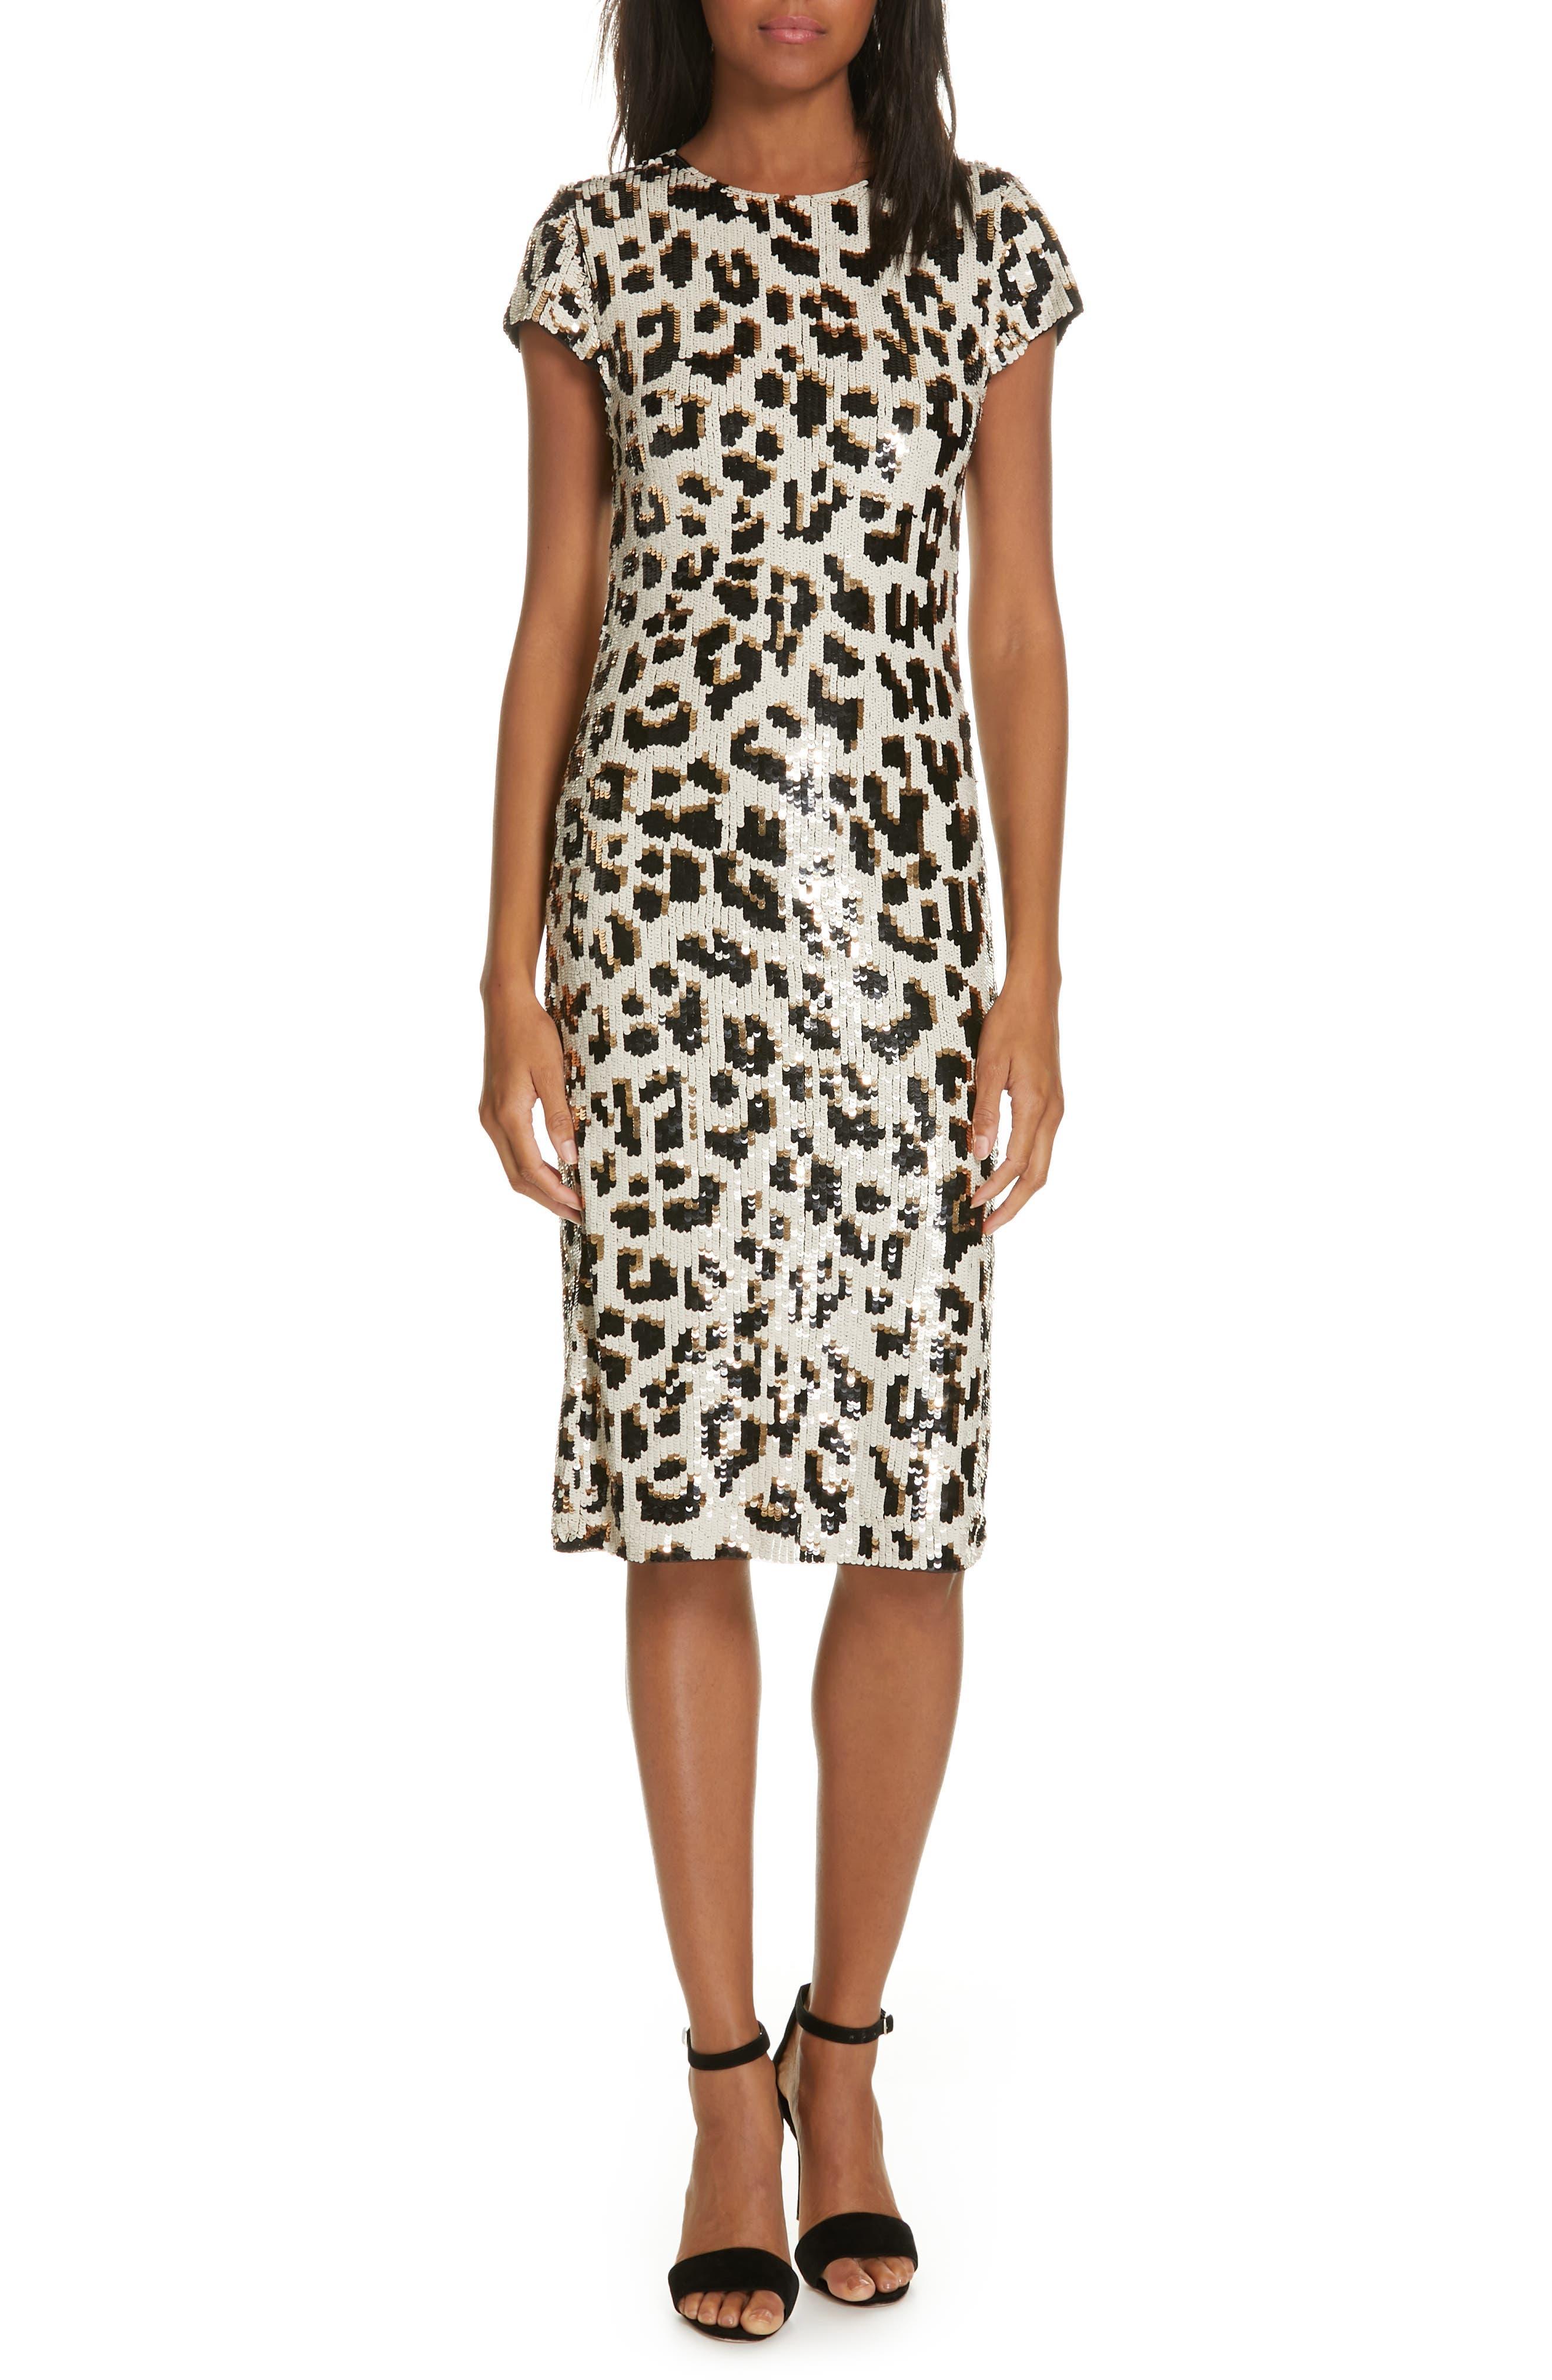 ALICE + OLIVIA,                             Nat Sequin Sheath Dress,                             Main thumbnail 1, color,                             LEOPARD